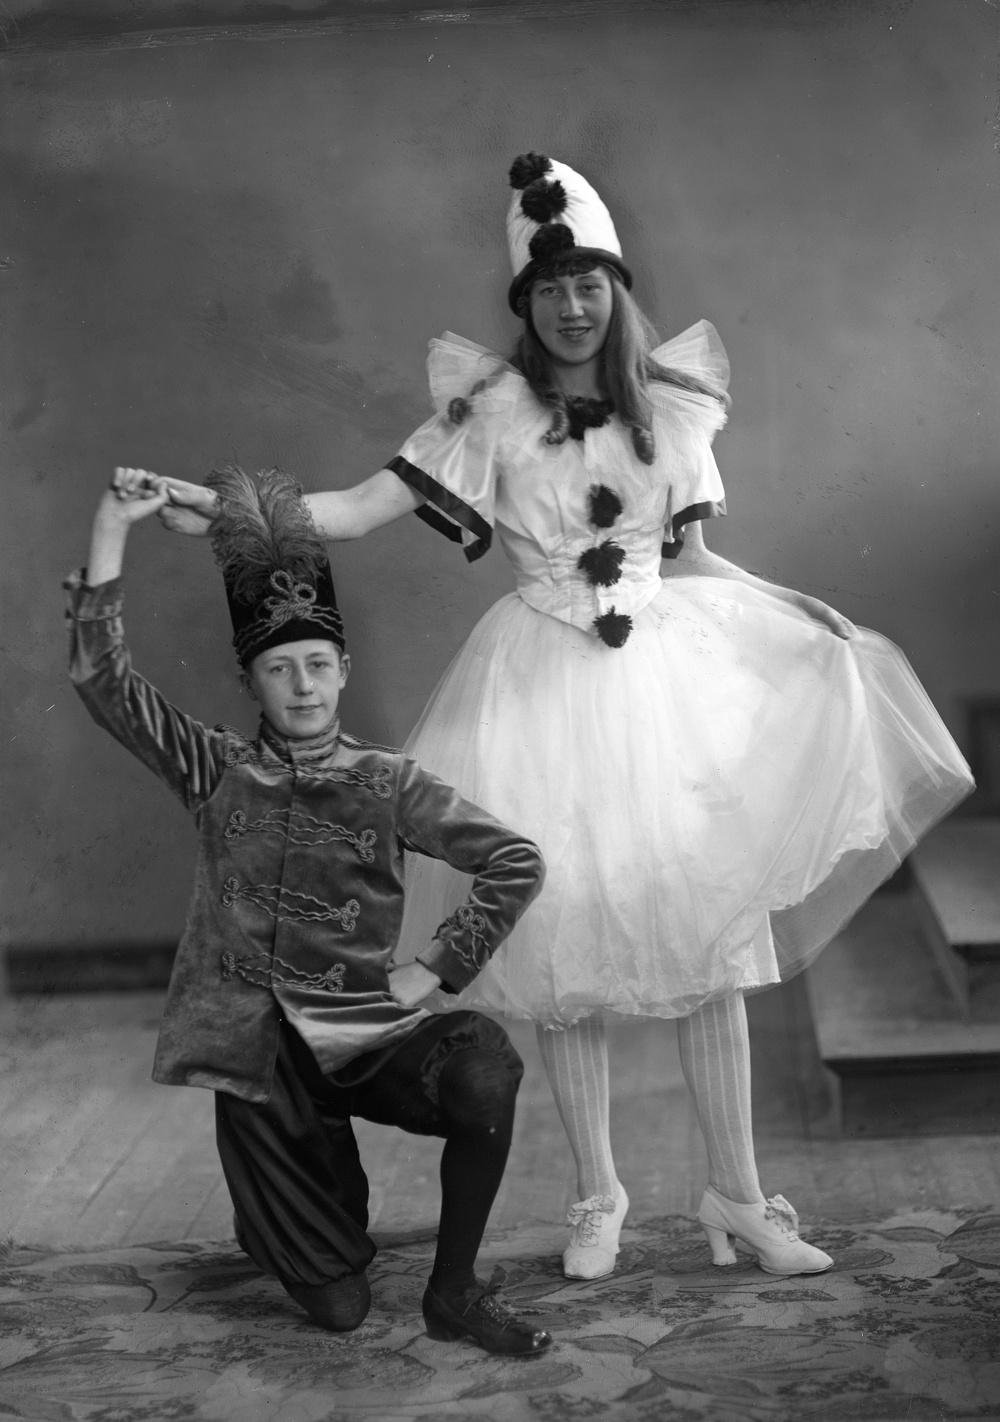 Foto: Ida Ekelund, ur Kulturens samlingar